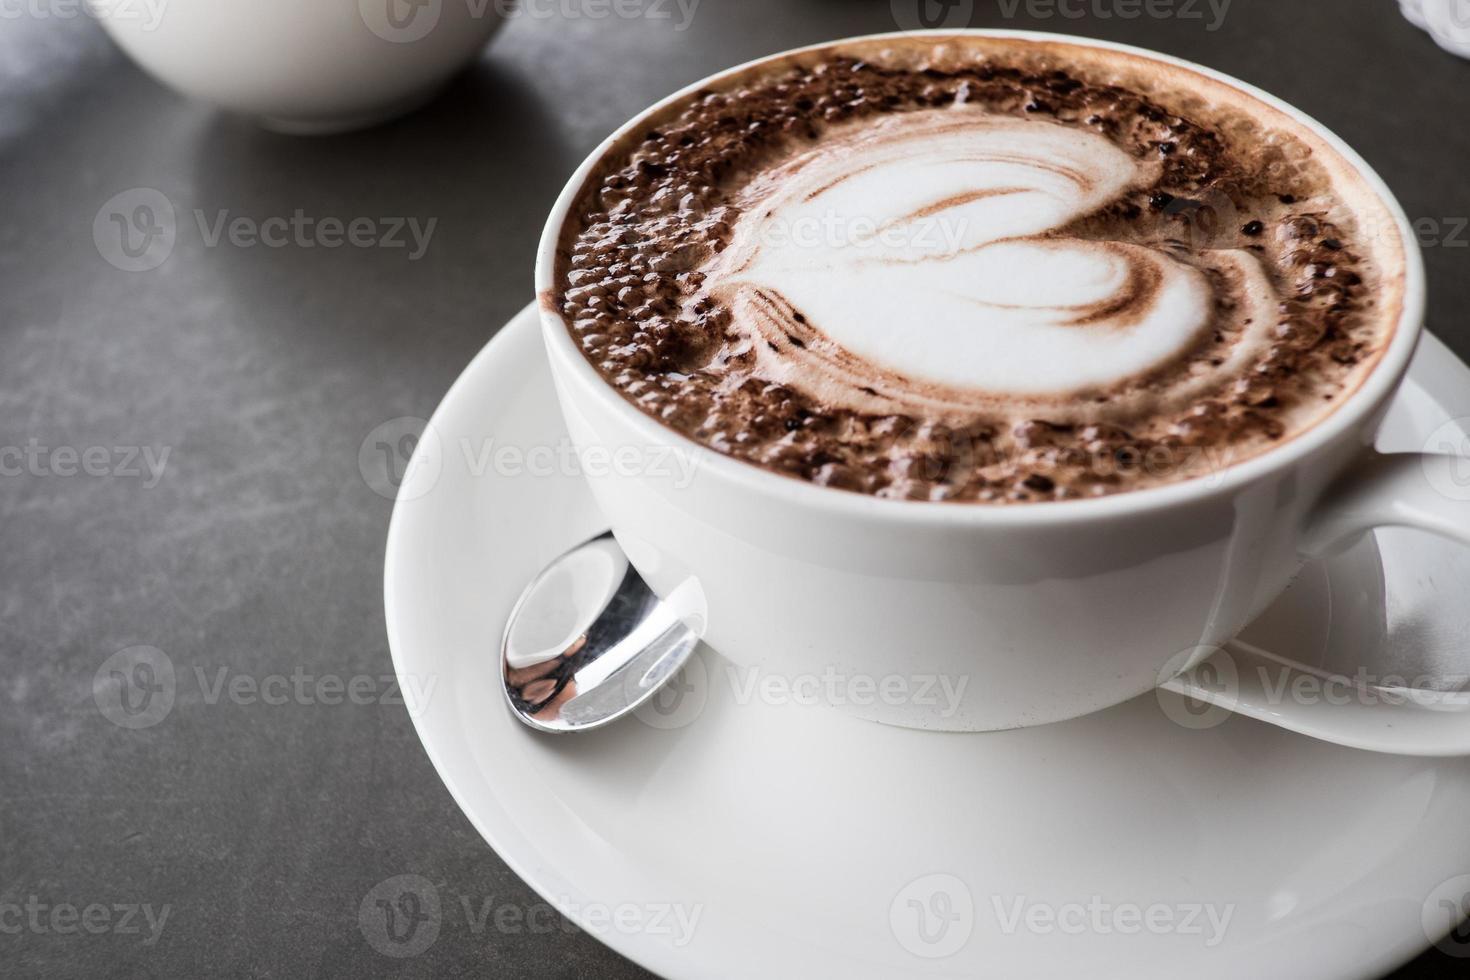 hartvorm latte art koffie foto